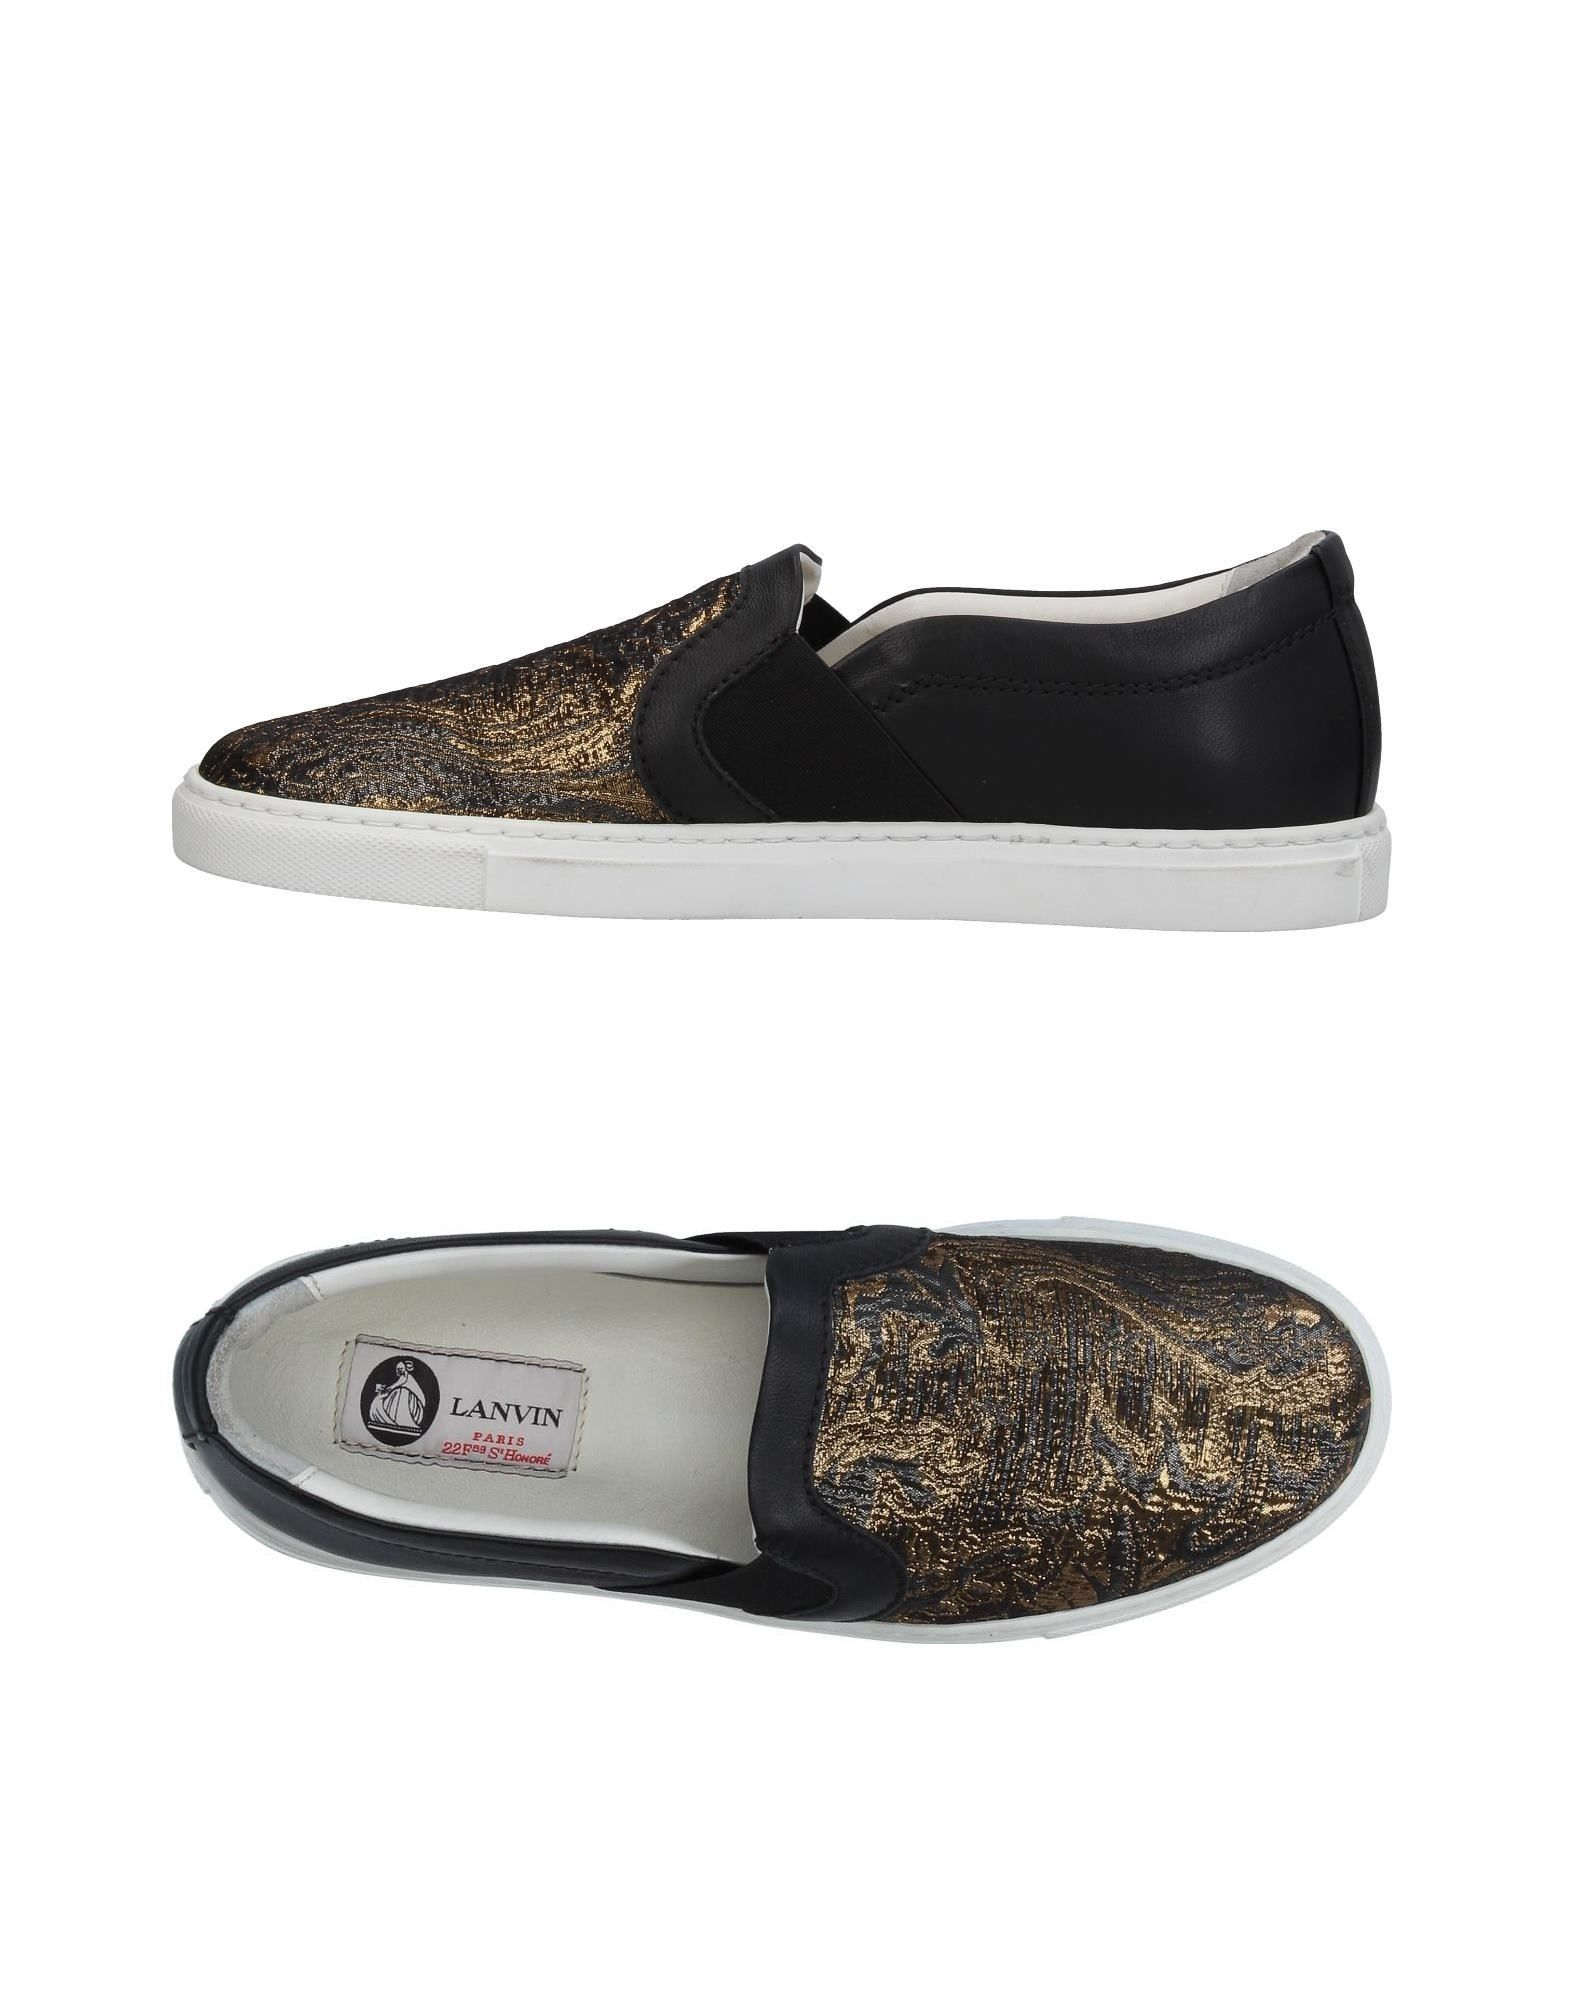 Lanvin Sneakers Damen  11369560SWGut aussehende strapazierfähige Schuhe